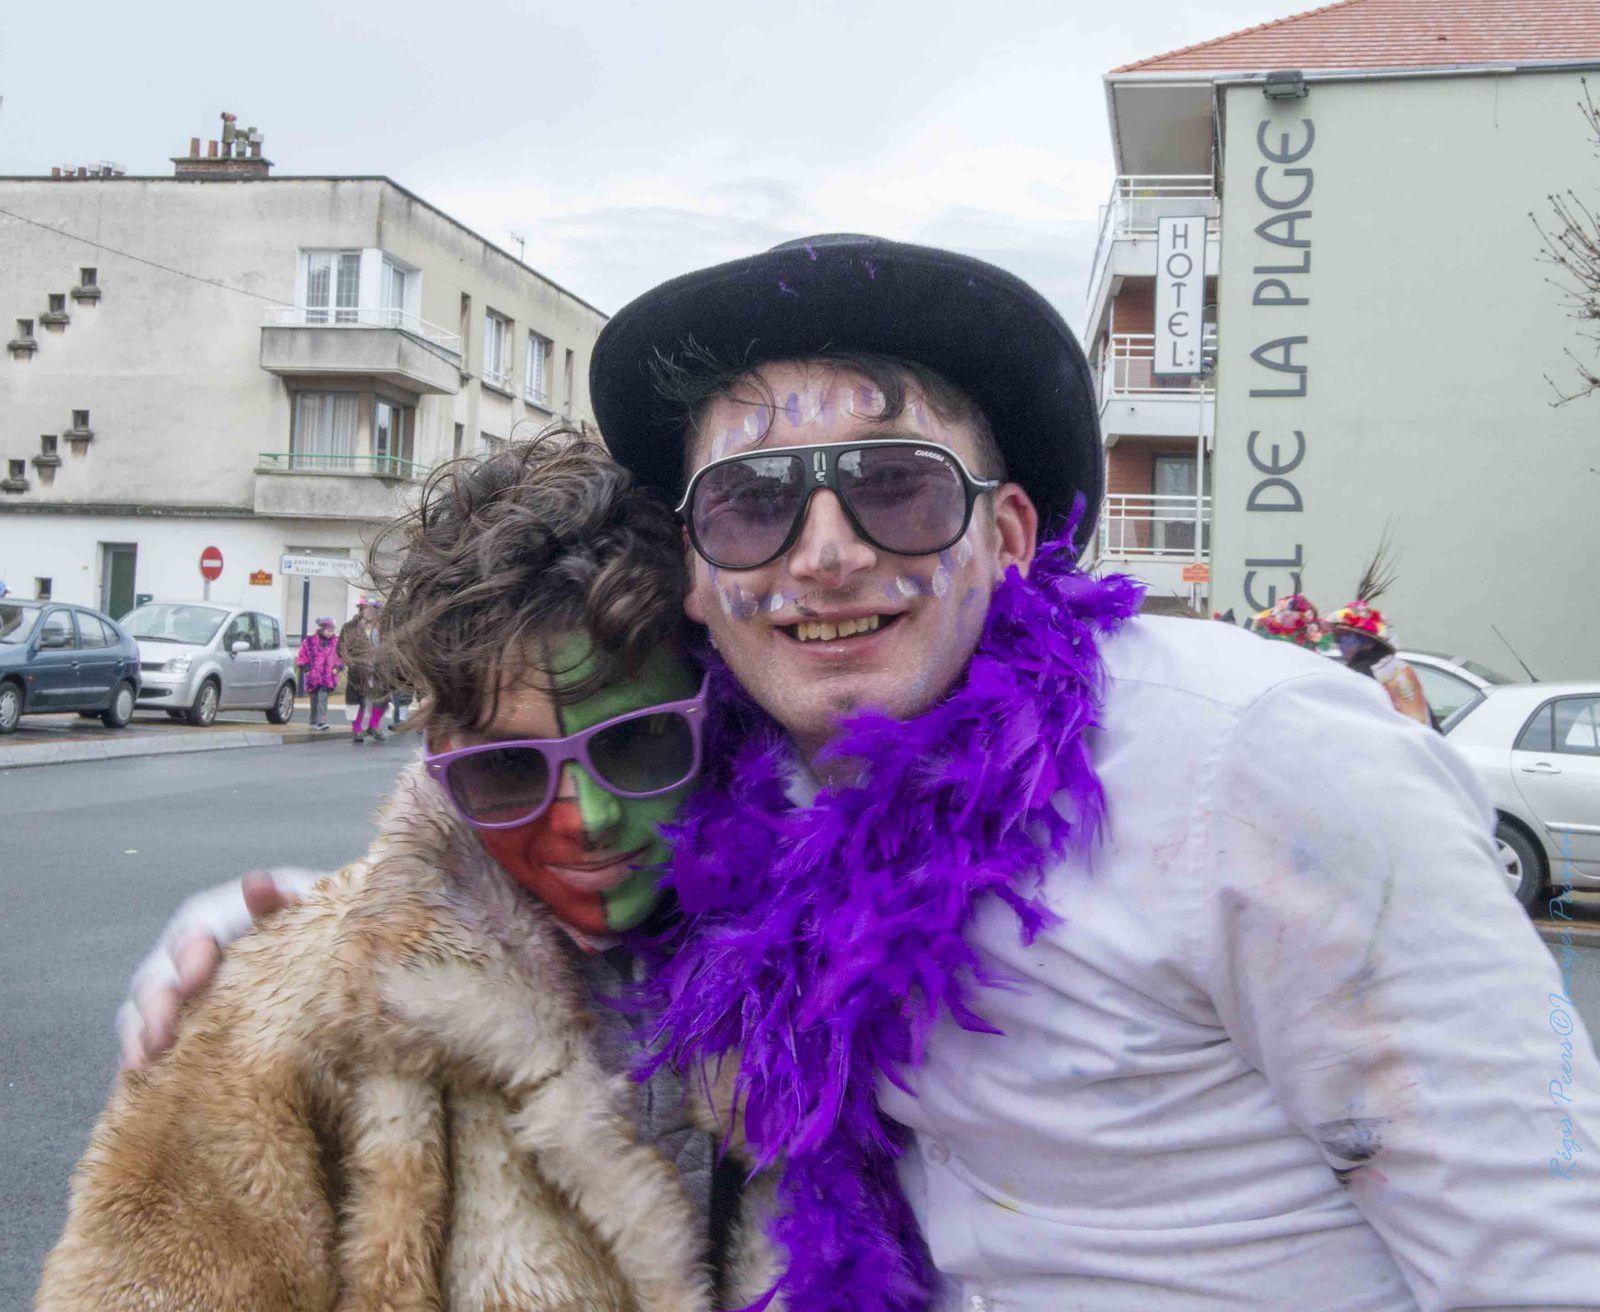 Carnaval de Dunkerque 2016 Bande de Malo-les-Bains